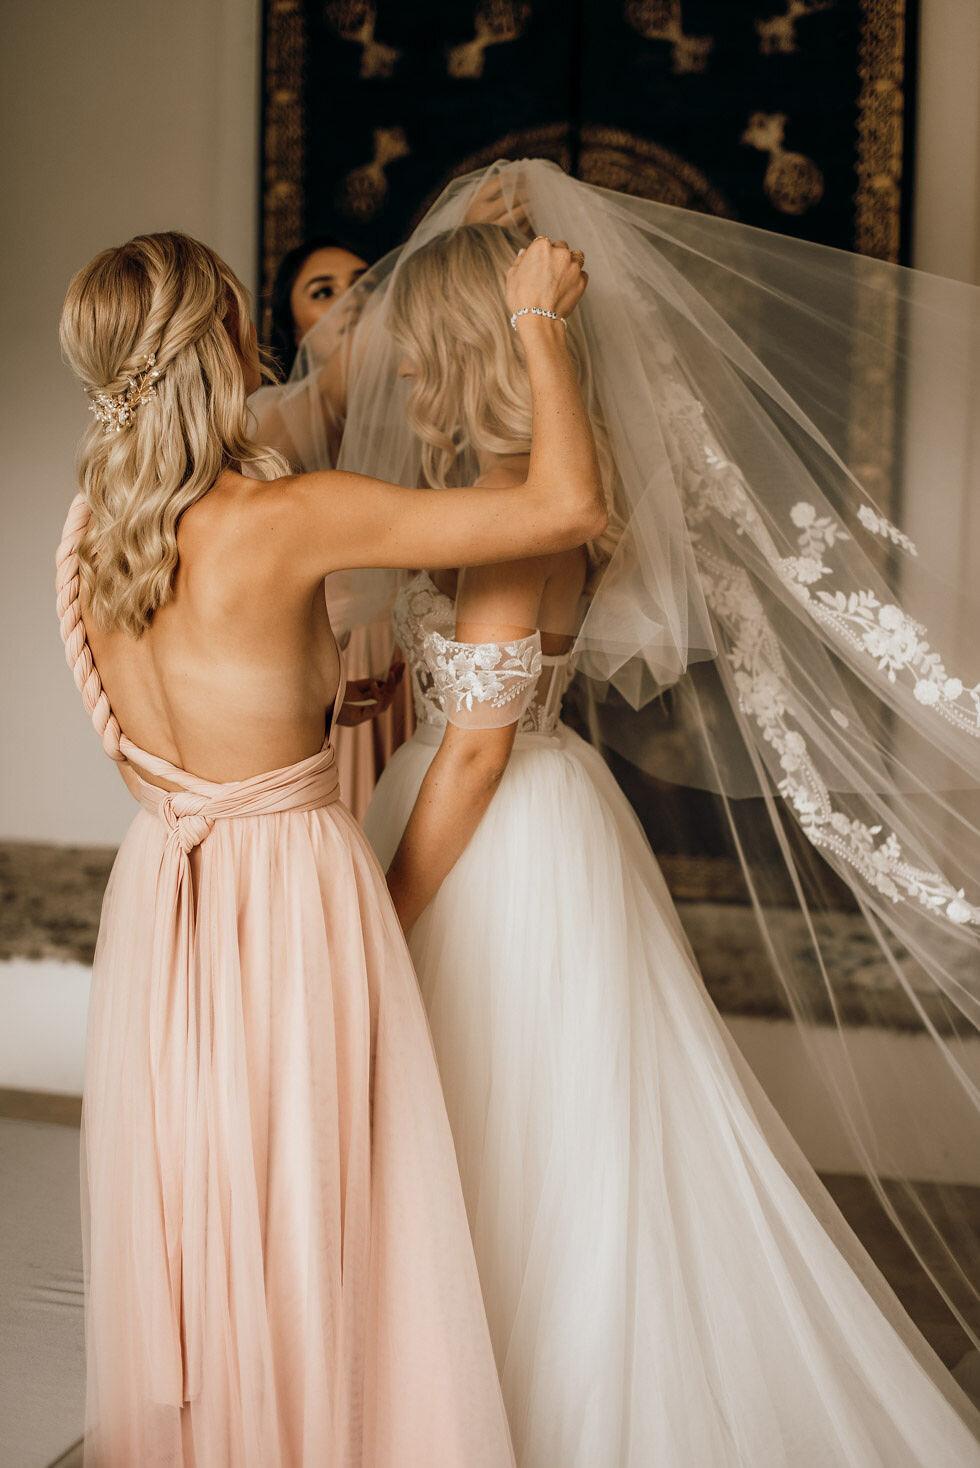 We-Are-Flowergirls-Bridesmaids-Dresses-Bride-PATRIZIA-PALME-©Beloved-Photography-1.jpg